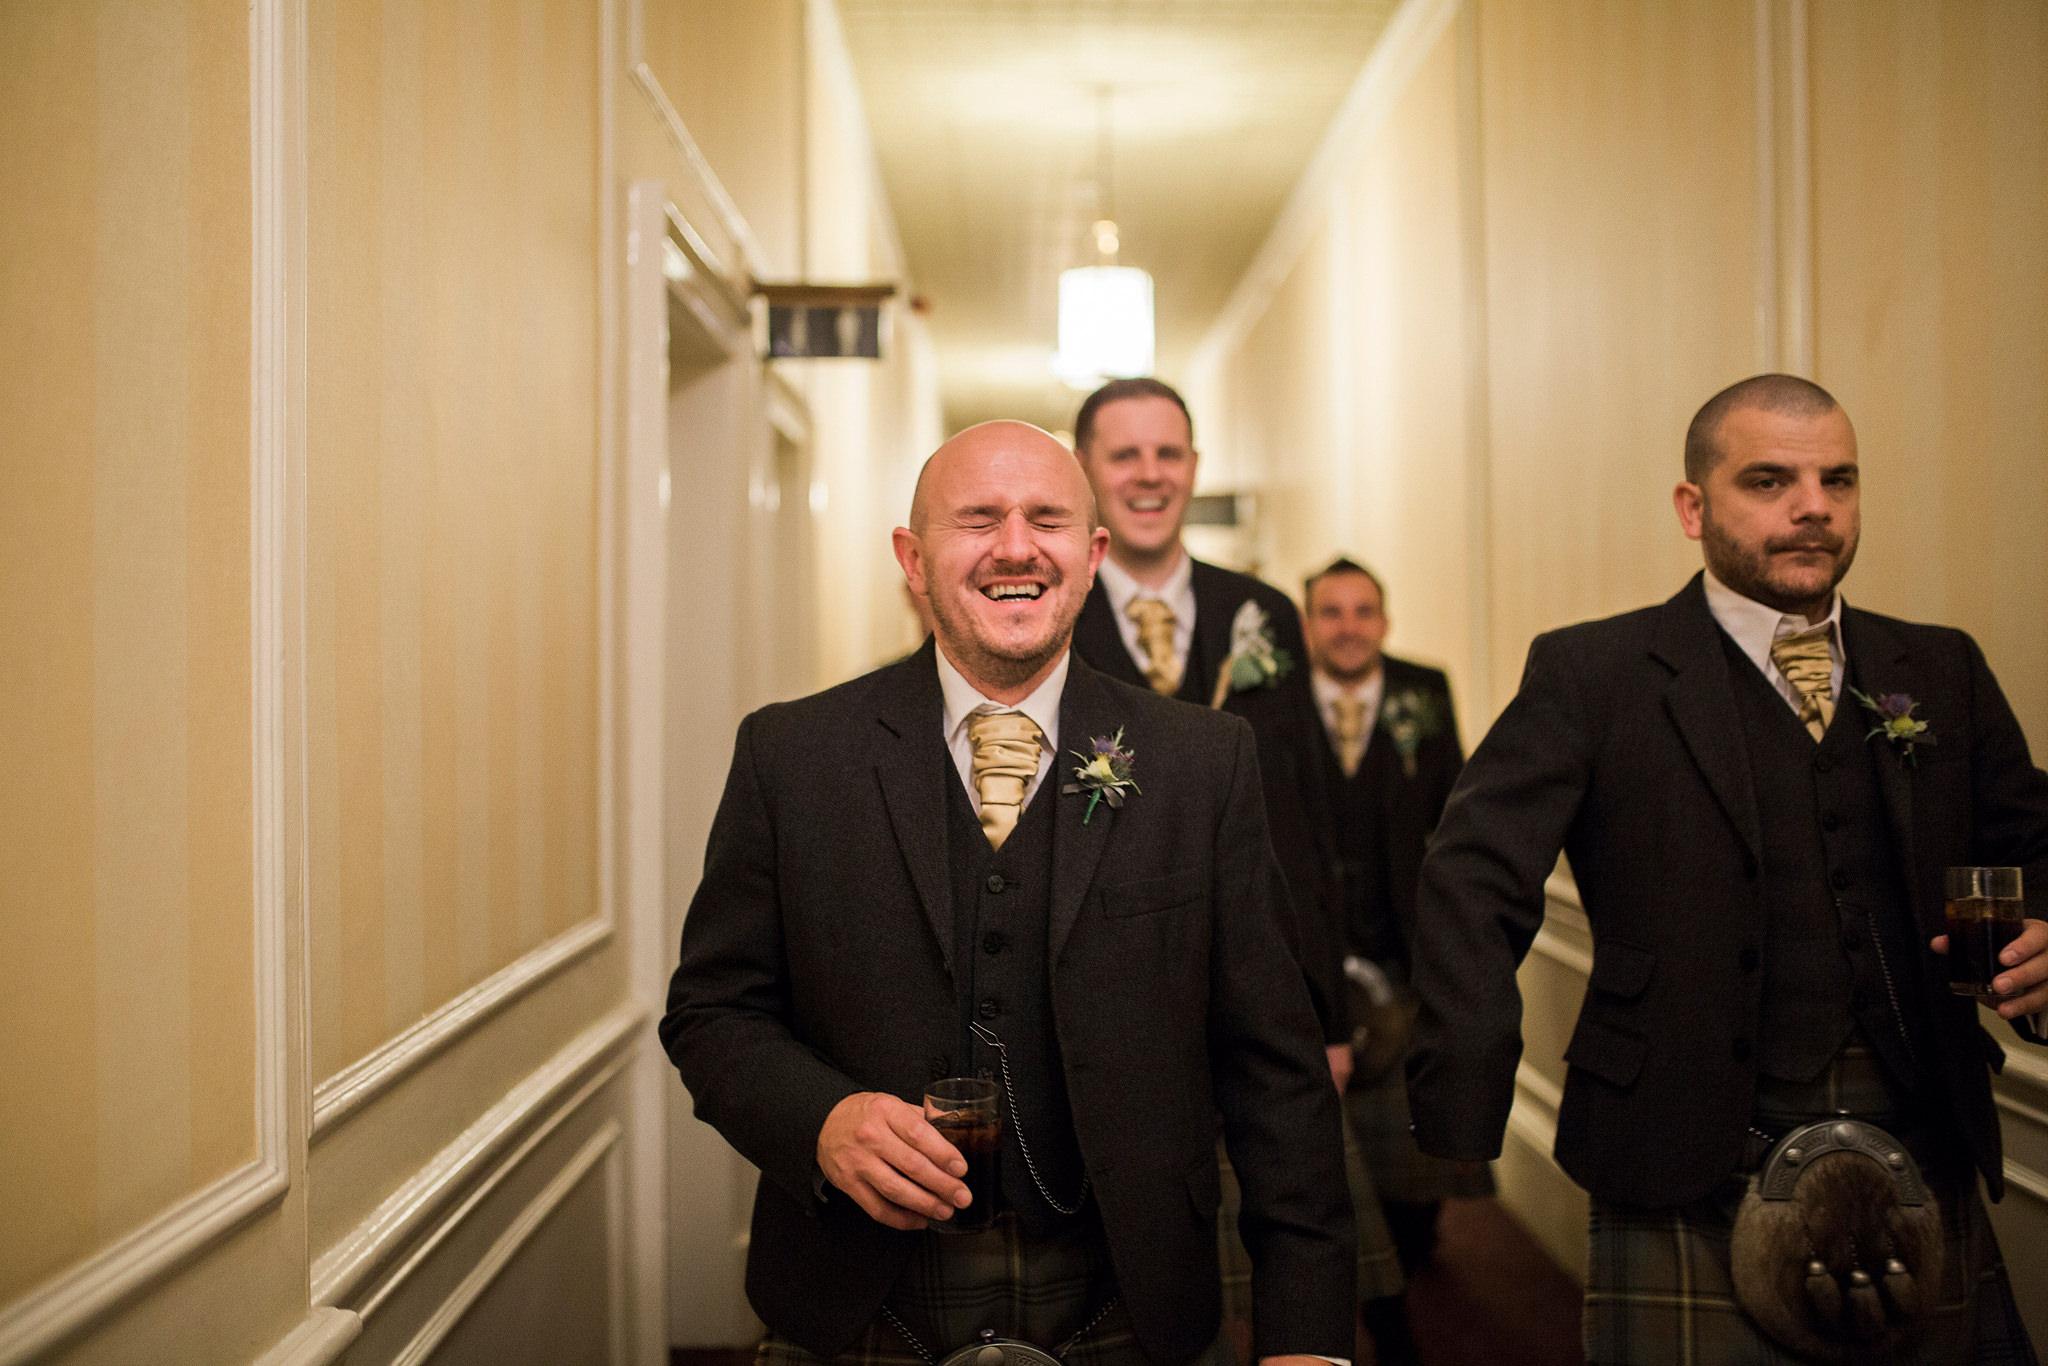 064-scotland-wedding-photographer.jpg